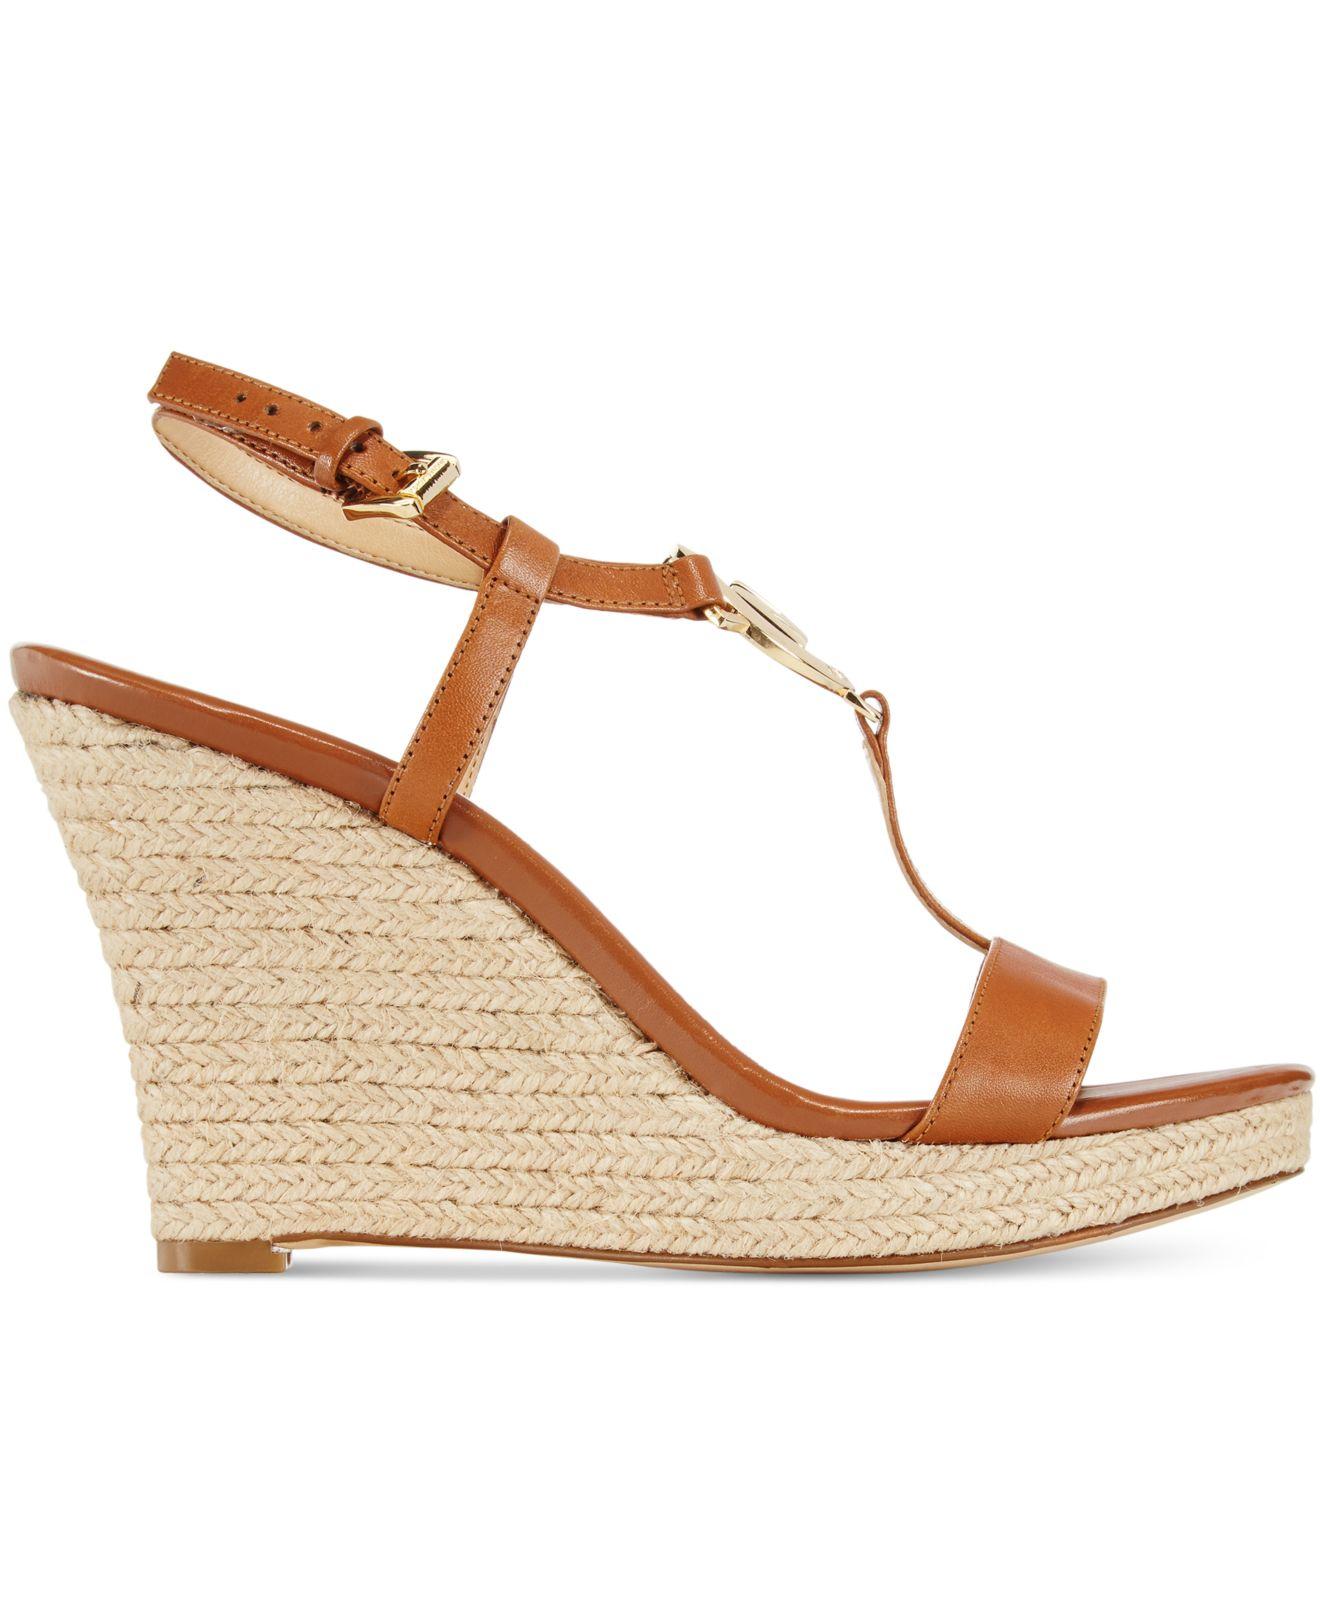 9f052427d4e7 Michael Kors Wedge Sneakers Womens